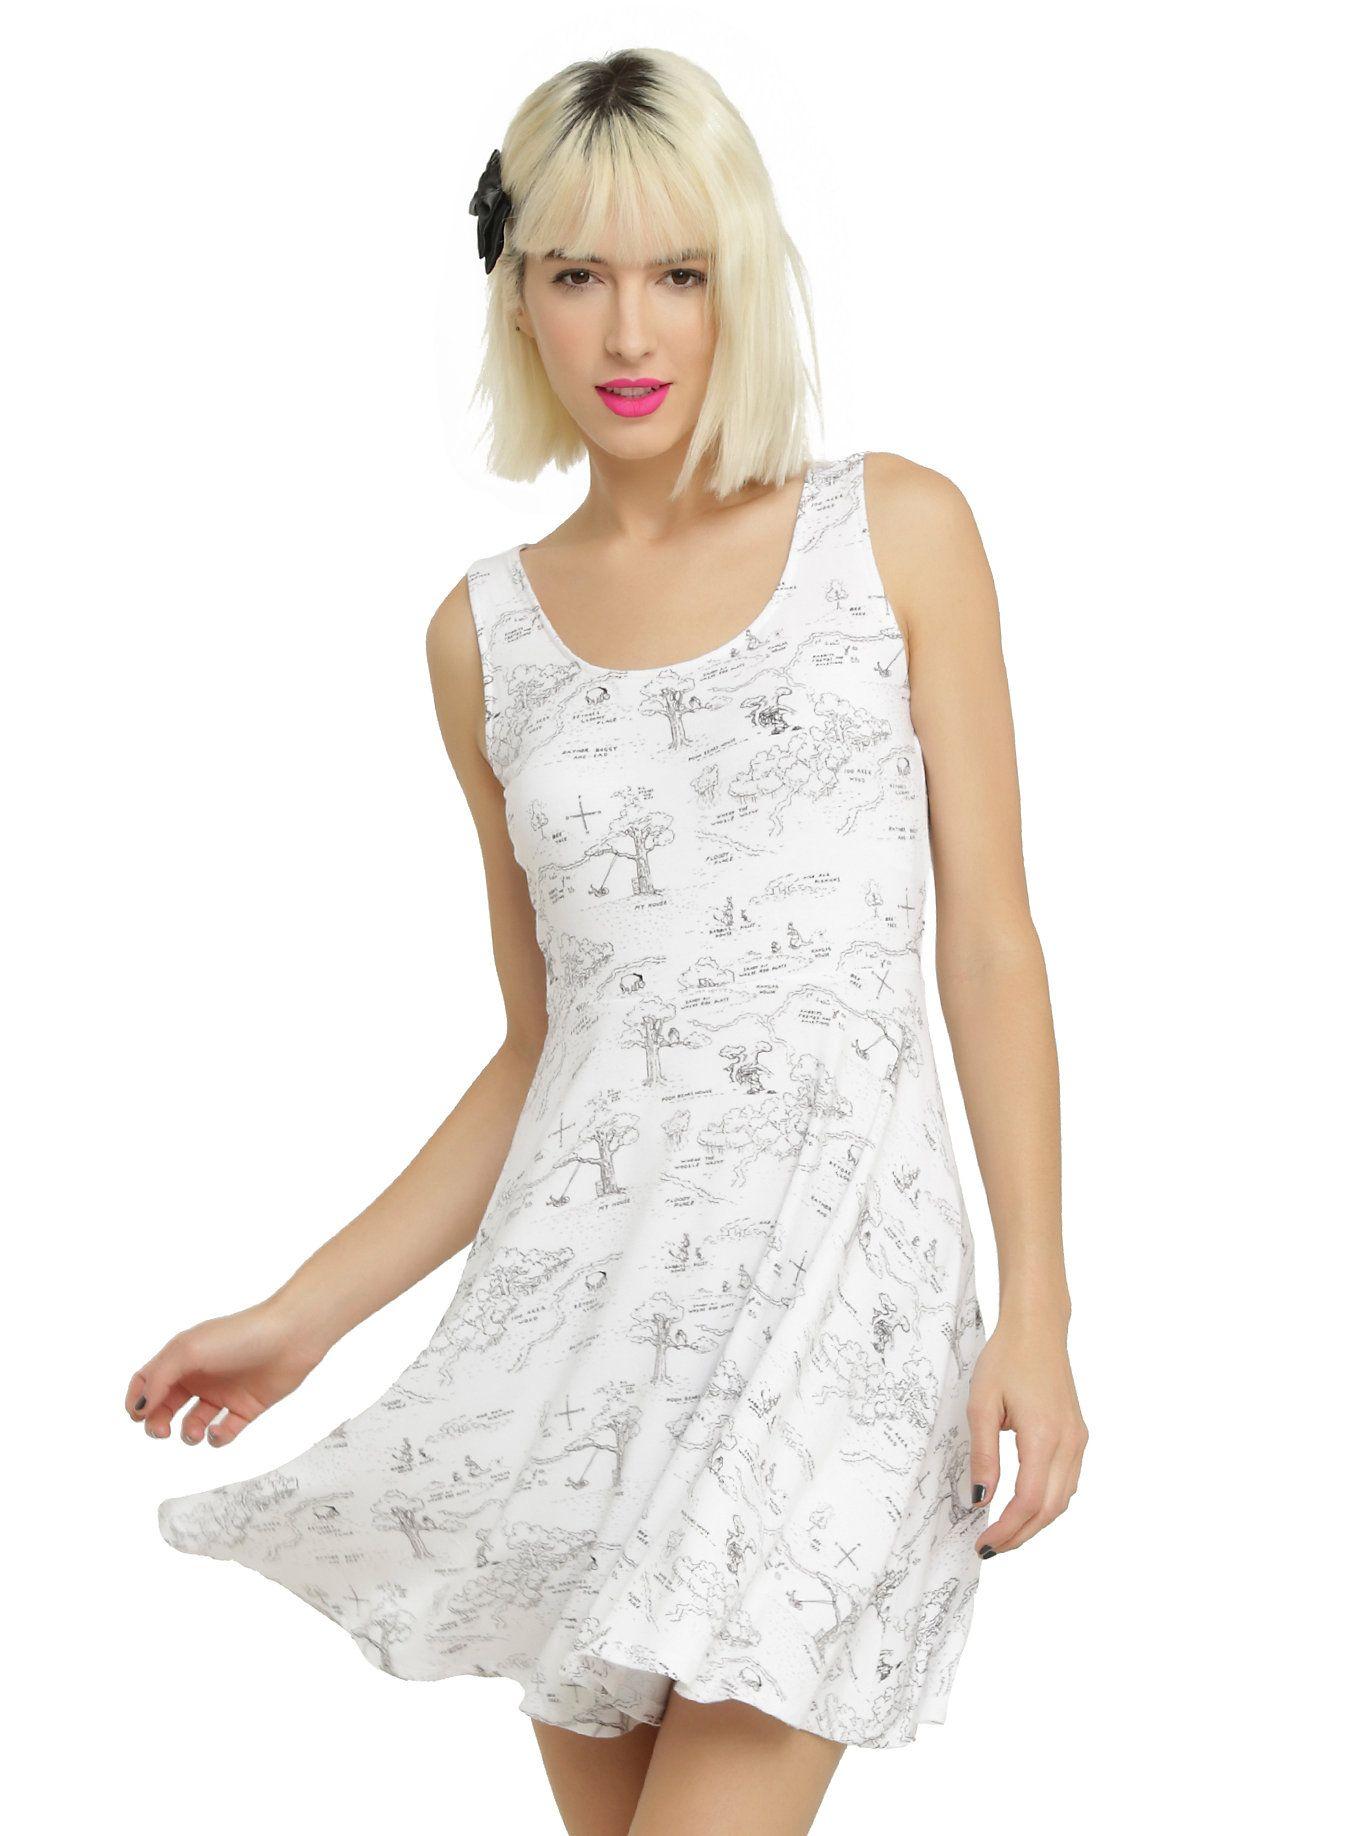 ba11fb7f2a07 Disney Winnie The Pooh Hundred Acre Wood Bow Back Dress   Clothes ...